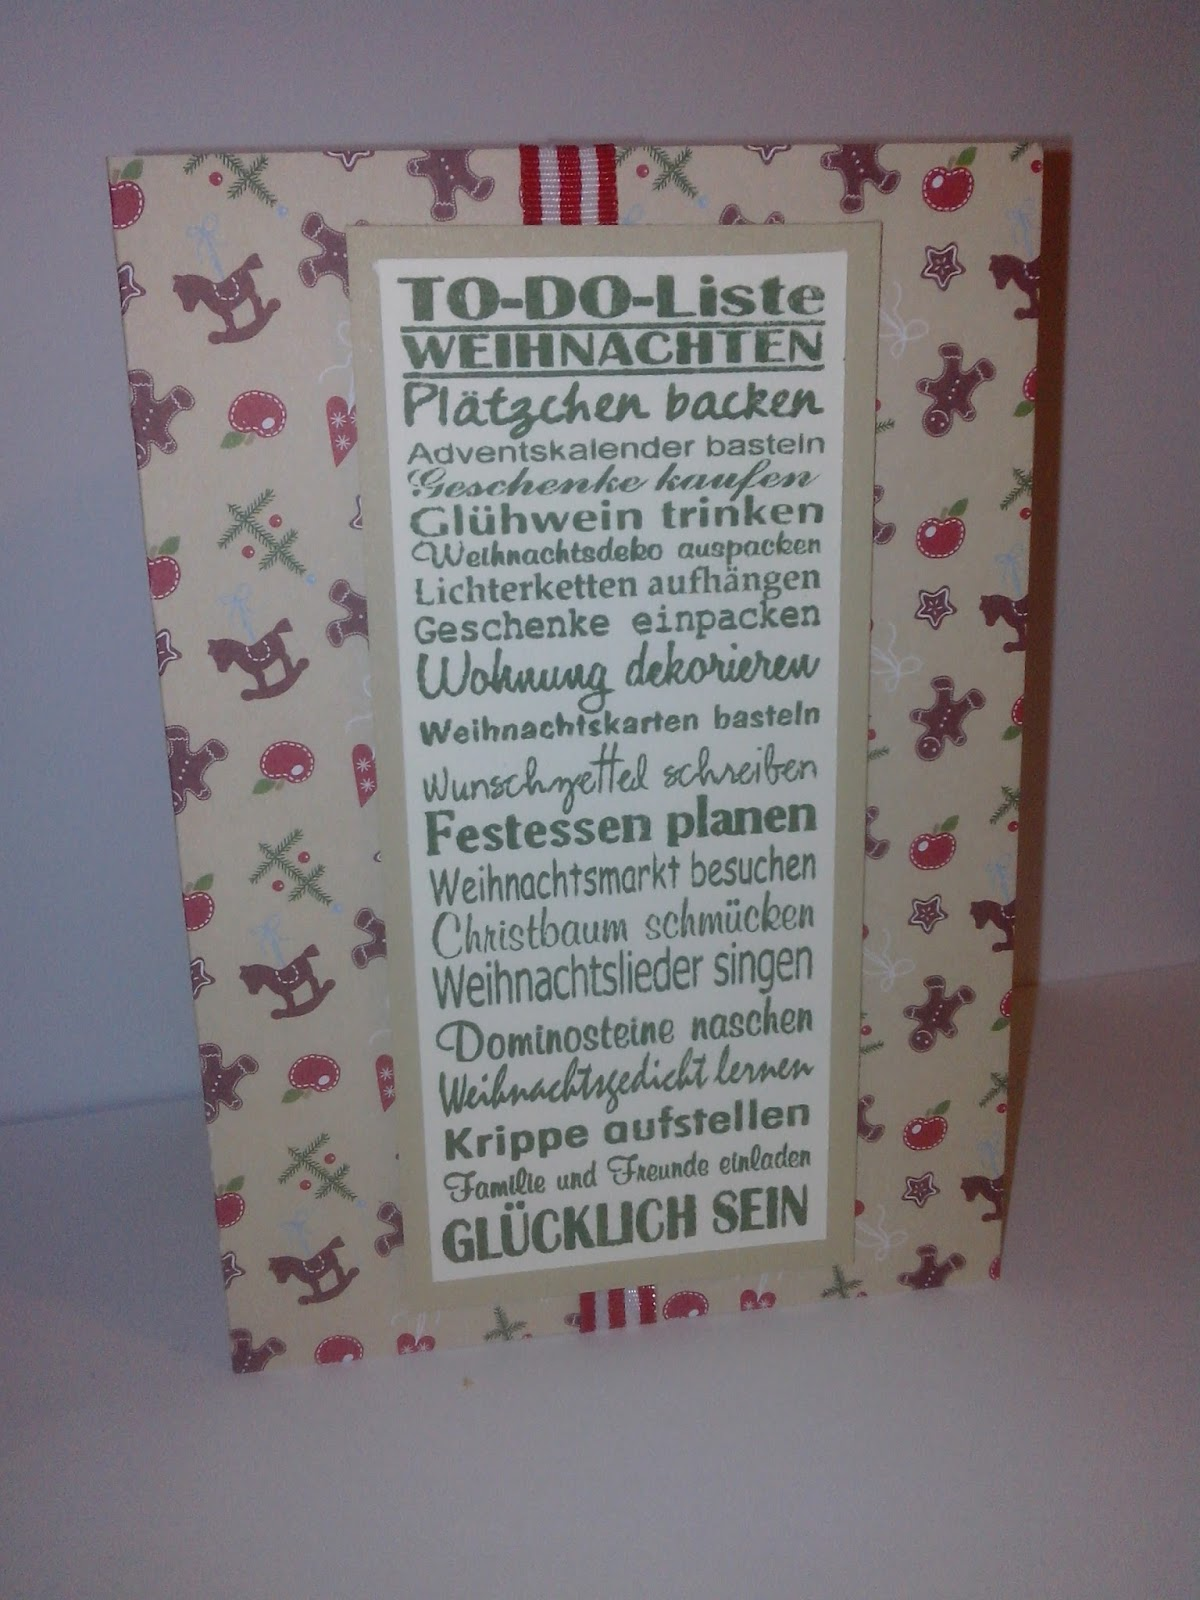 Papierstube Berlin: To-Do-Liste Weihnachten